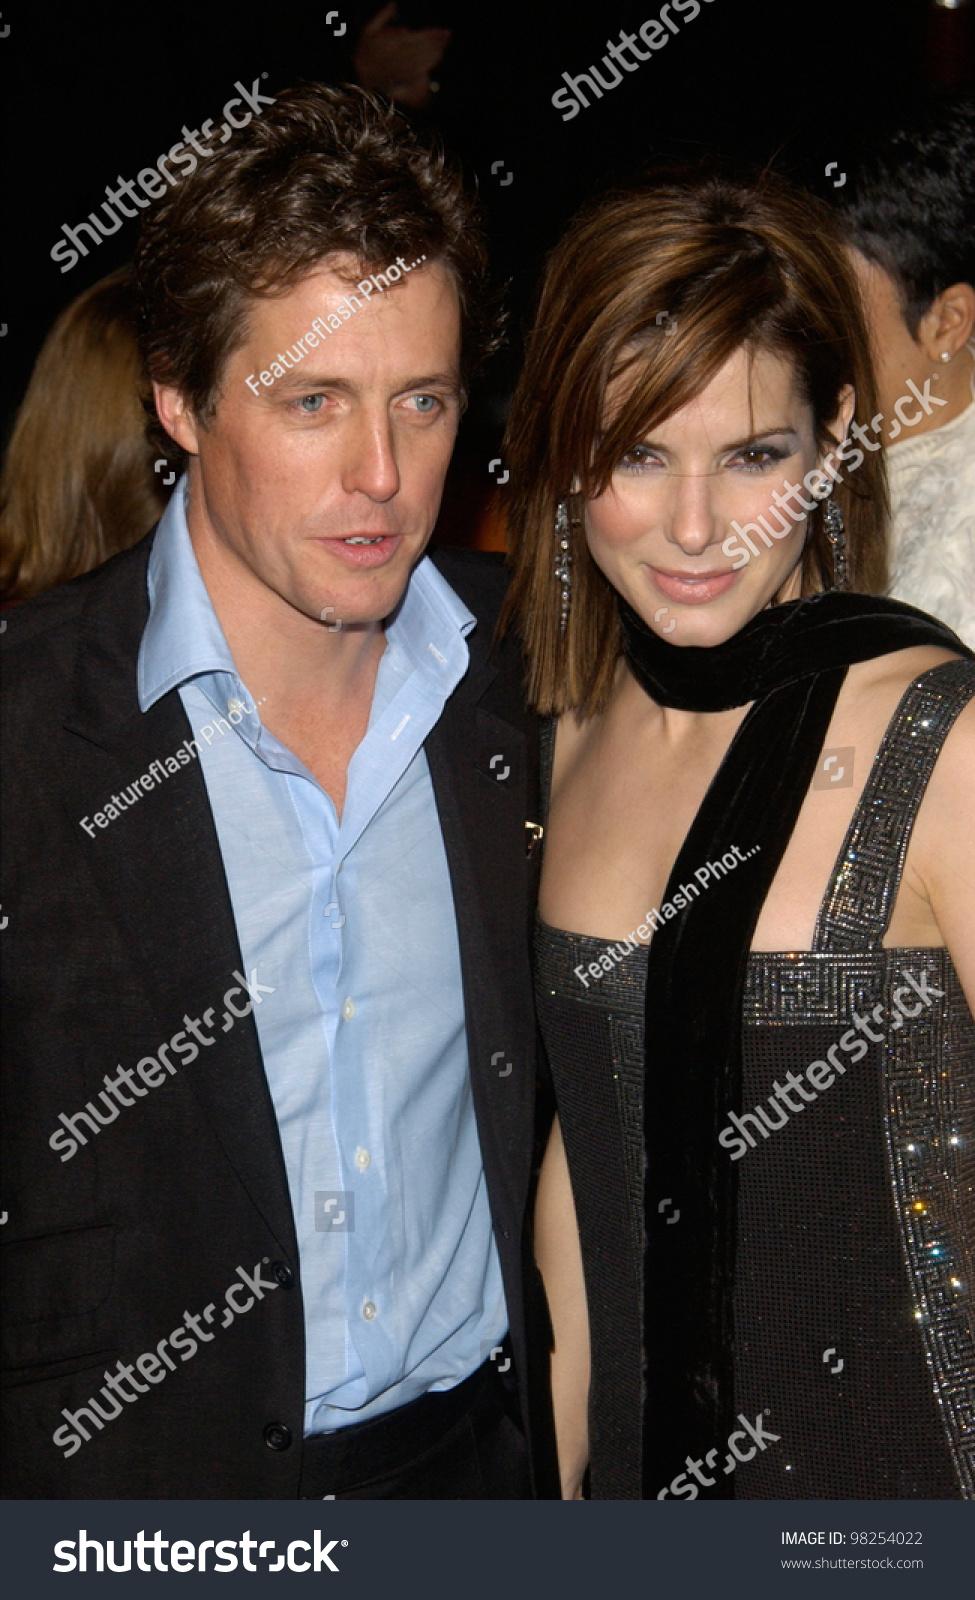 Susanna Hunt,Mary Beth Evans born March 7, 1961 (age 57) Hot nude Sara Erikson,Thomas Sangster (born 1990)